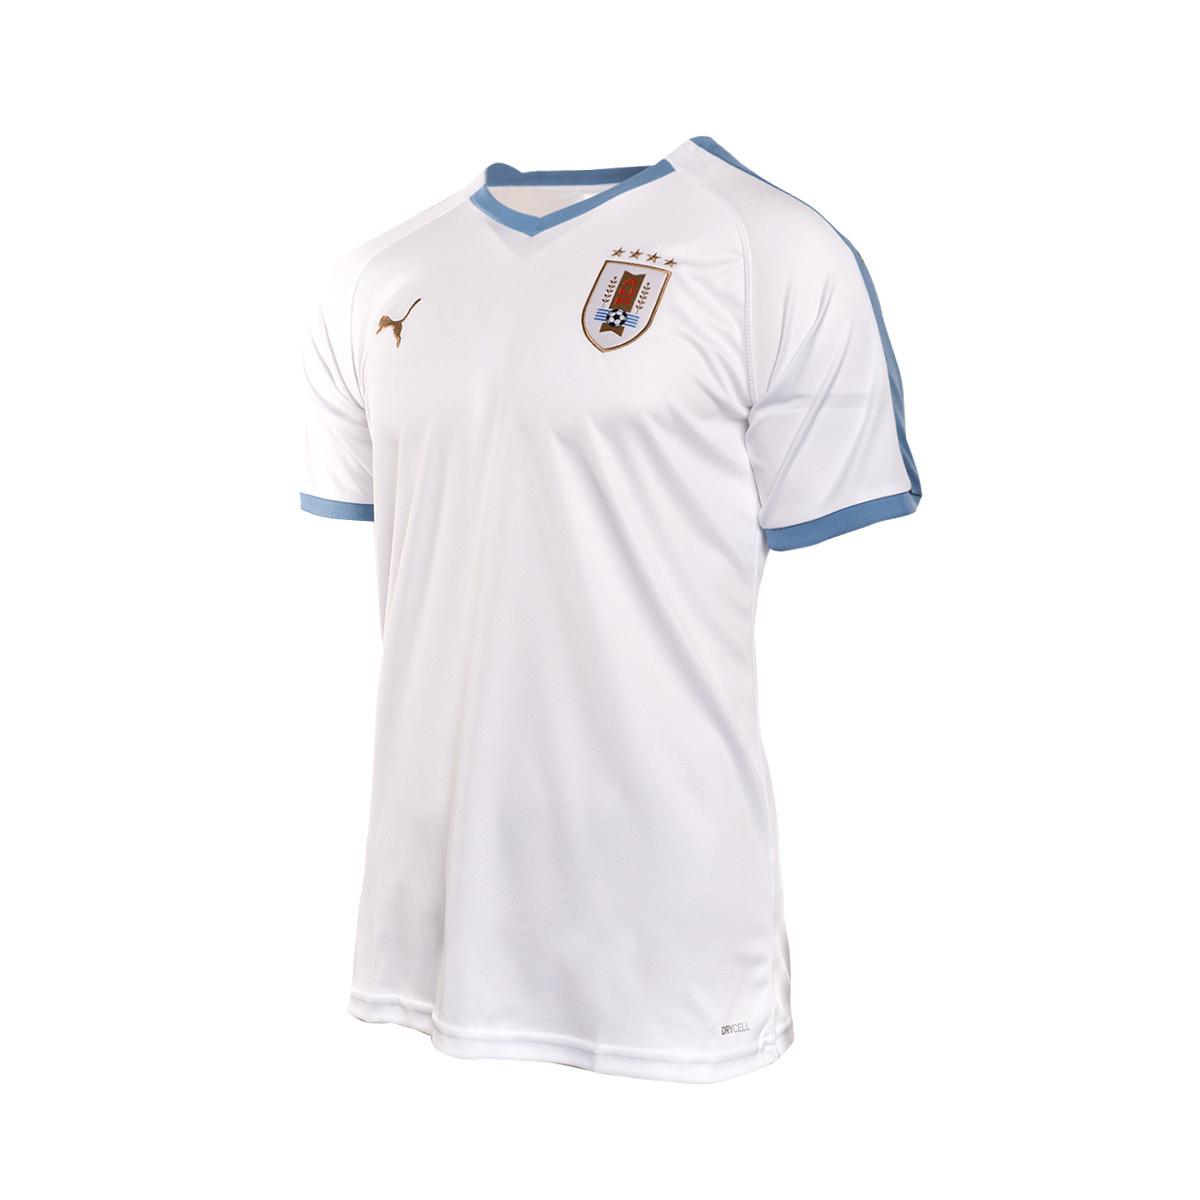 hot sale online 03b8b 8c485 Camiseta Uruguay Segunda Equipación 2019-2019 Puma white